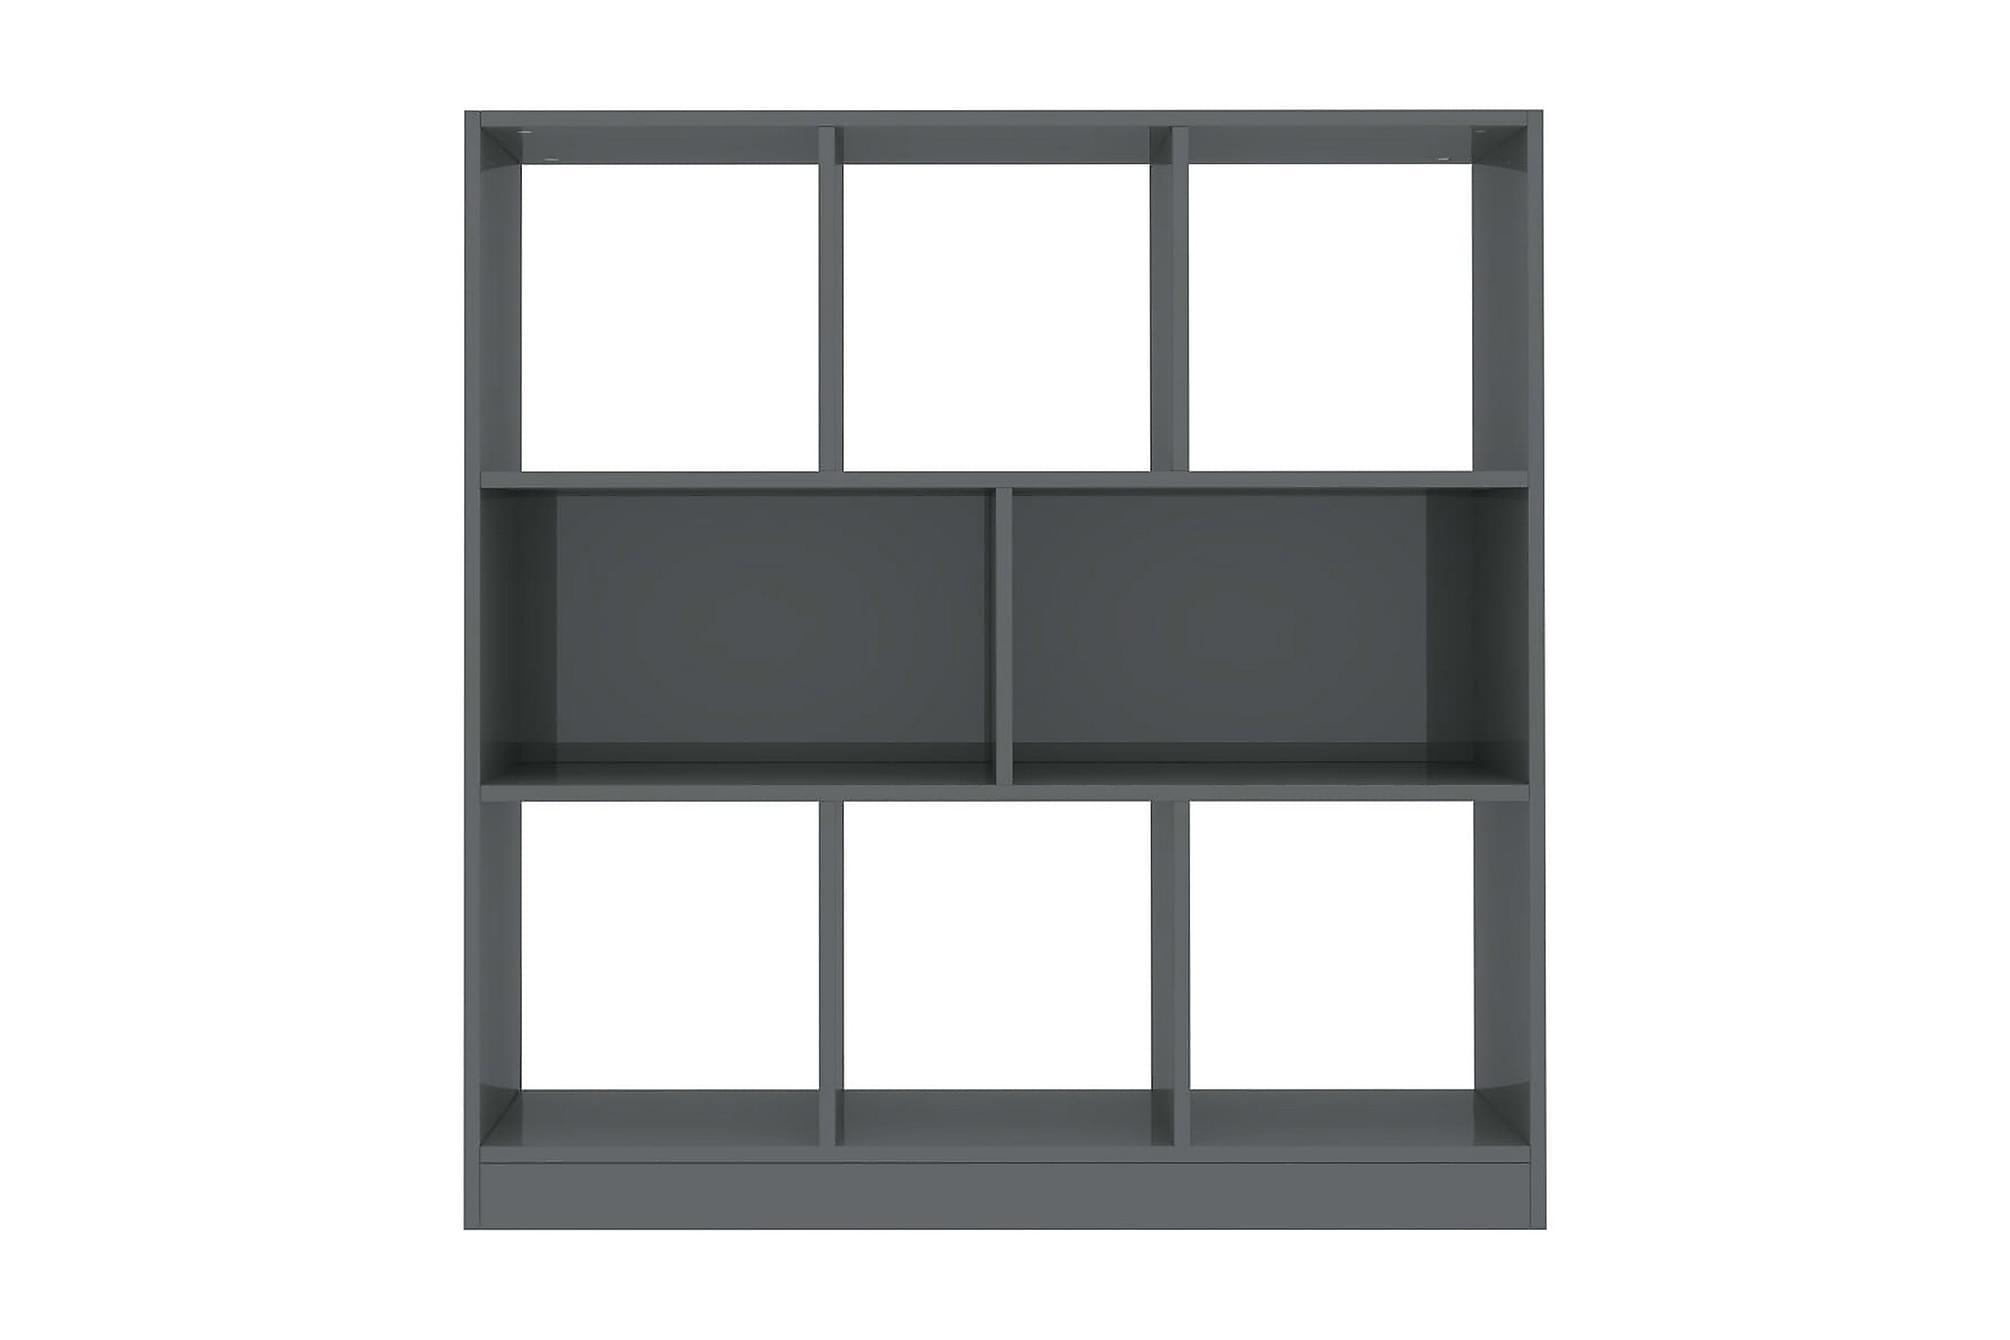 Bokhylla högglans grå 97,5x29,5x100 cm spånskiva, Hyllor